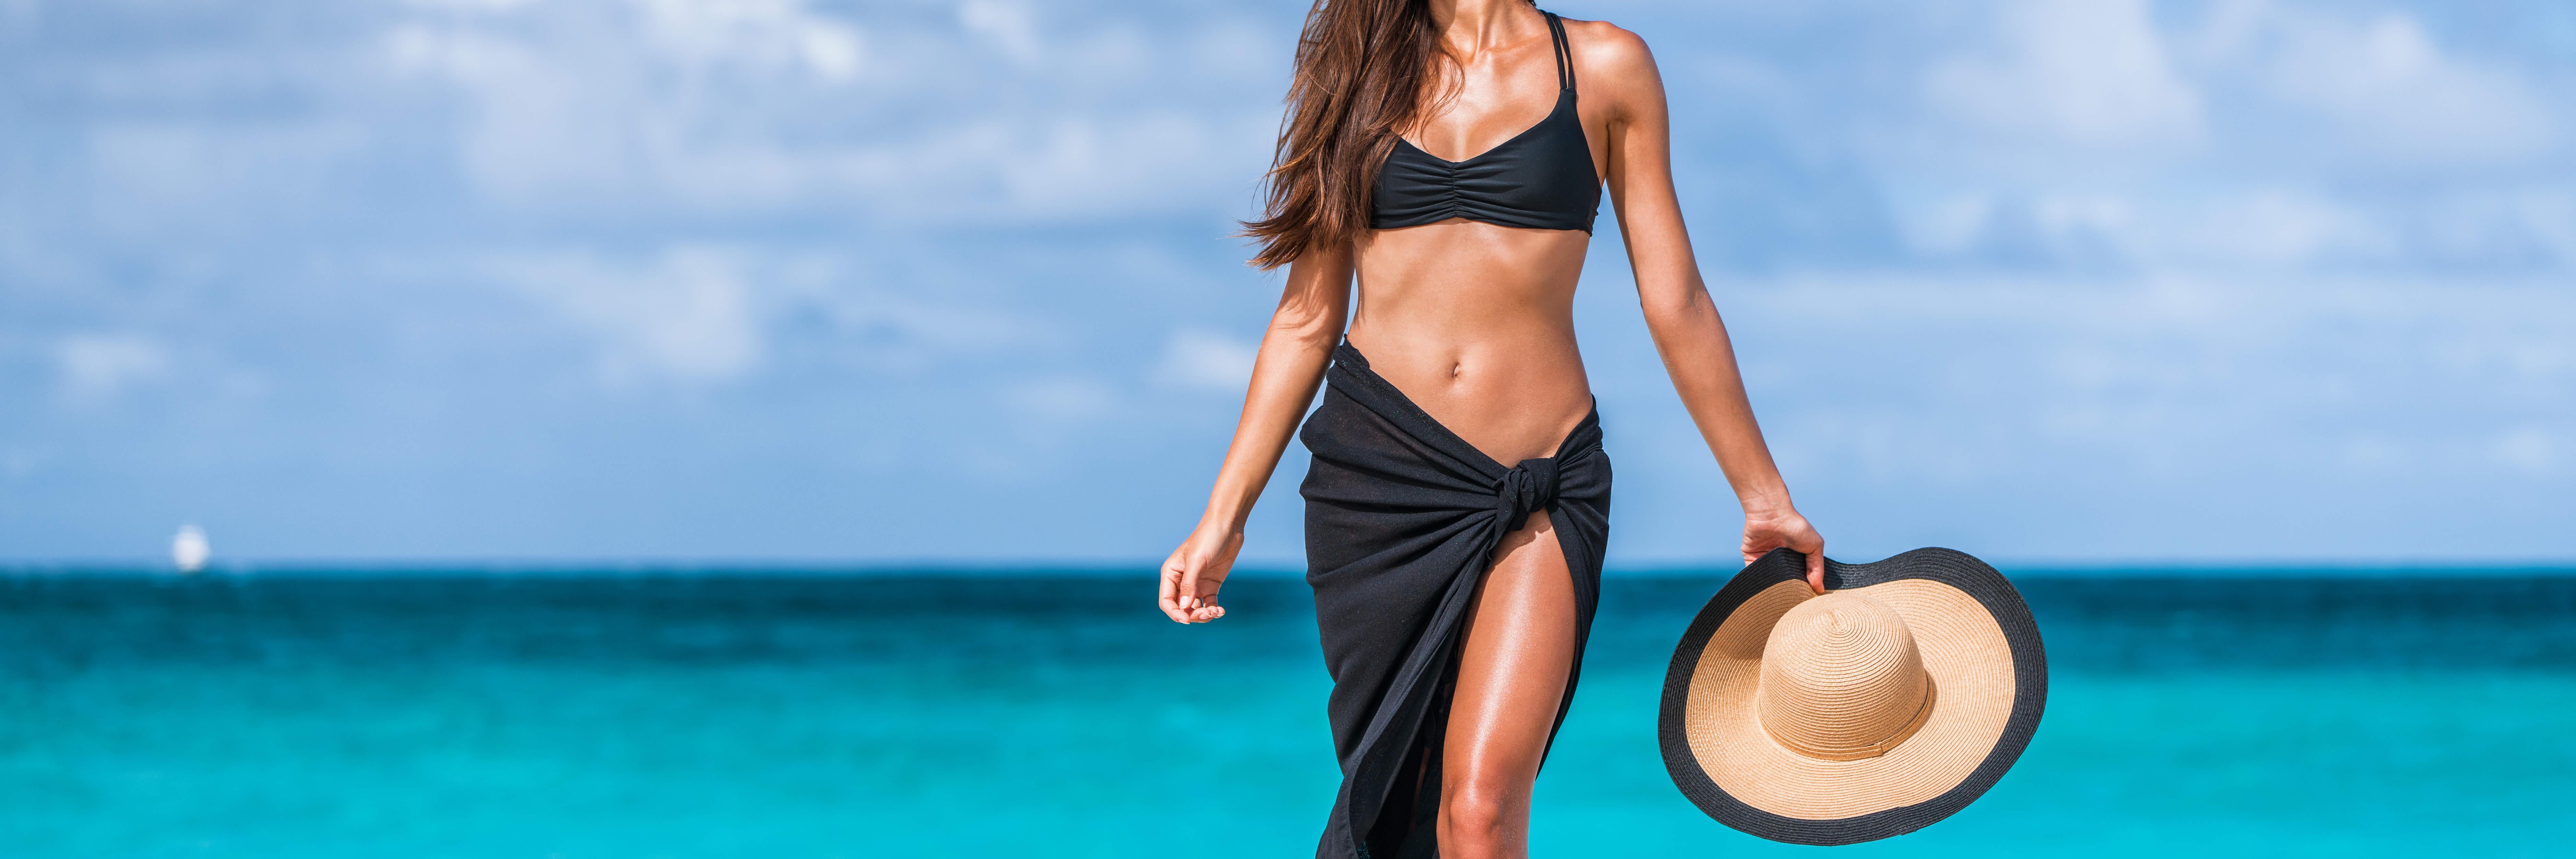 Mujer Playa Depilada